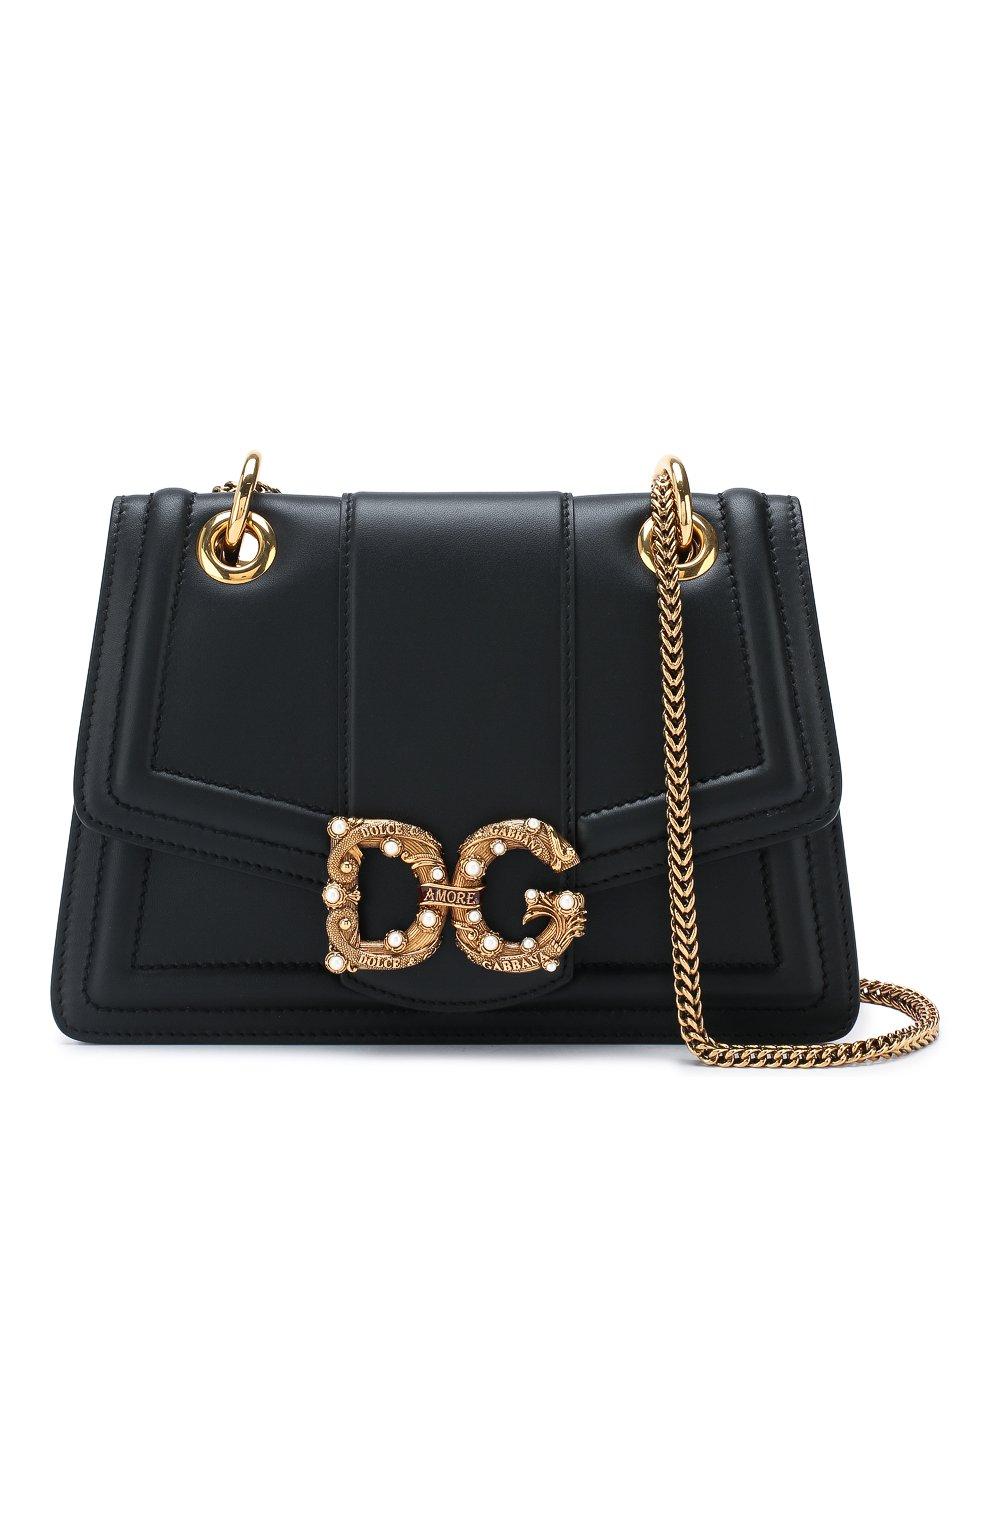 4e6fc77bb57a Женская сумка dg amore DOLCE & GABBANA черная цвета — купить за ...